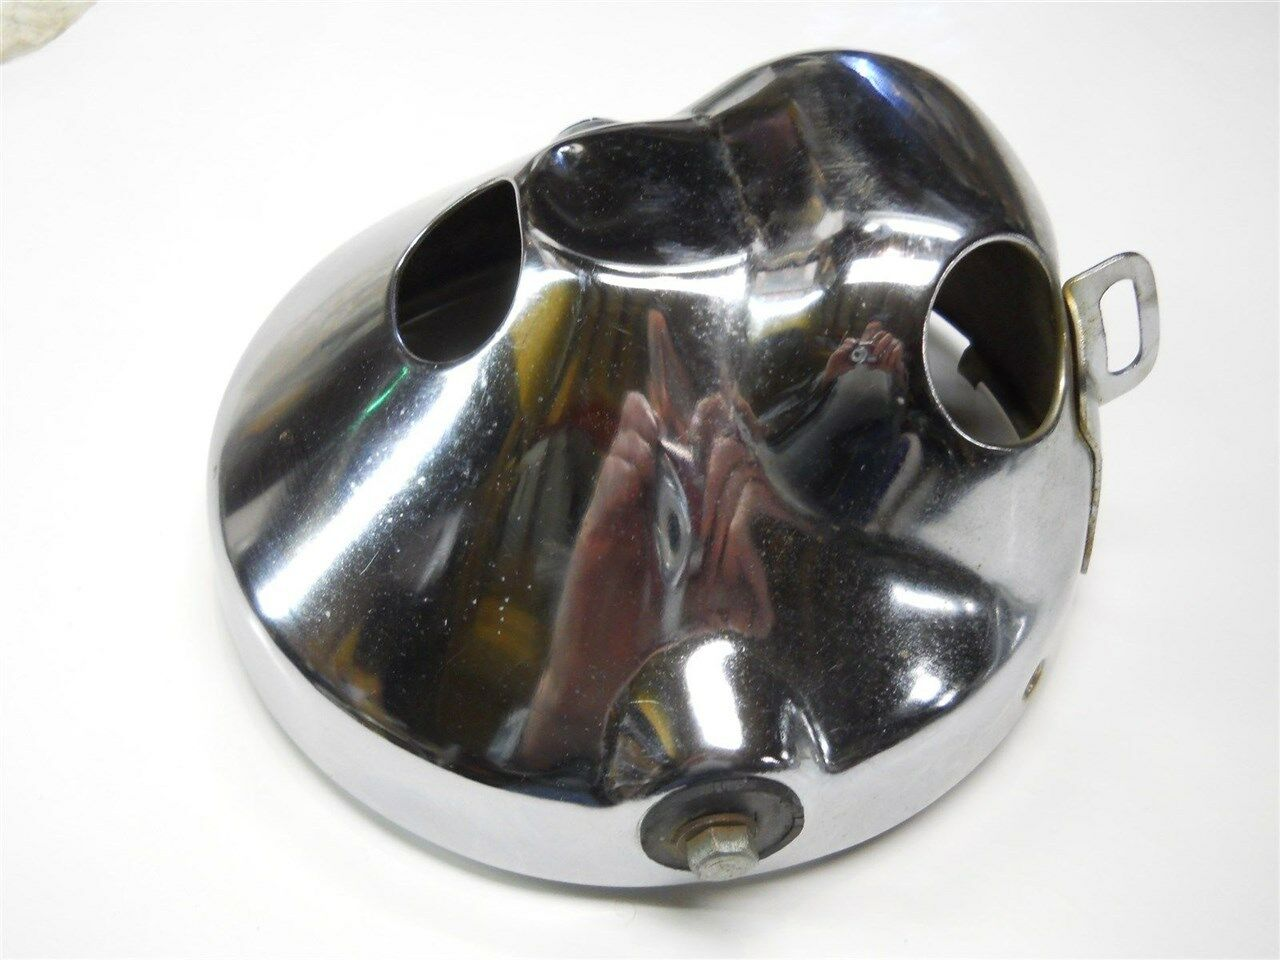 Blinker-Set Yamaha SR 500 XJ 650 XS 750 850 341-83330-72 2J4-83330-40